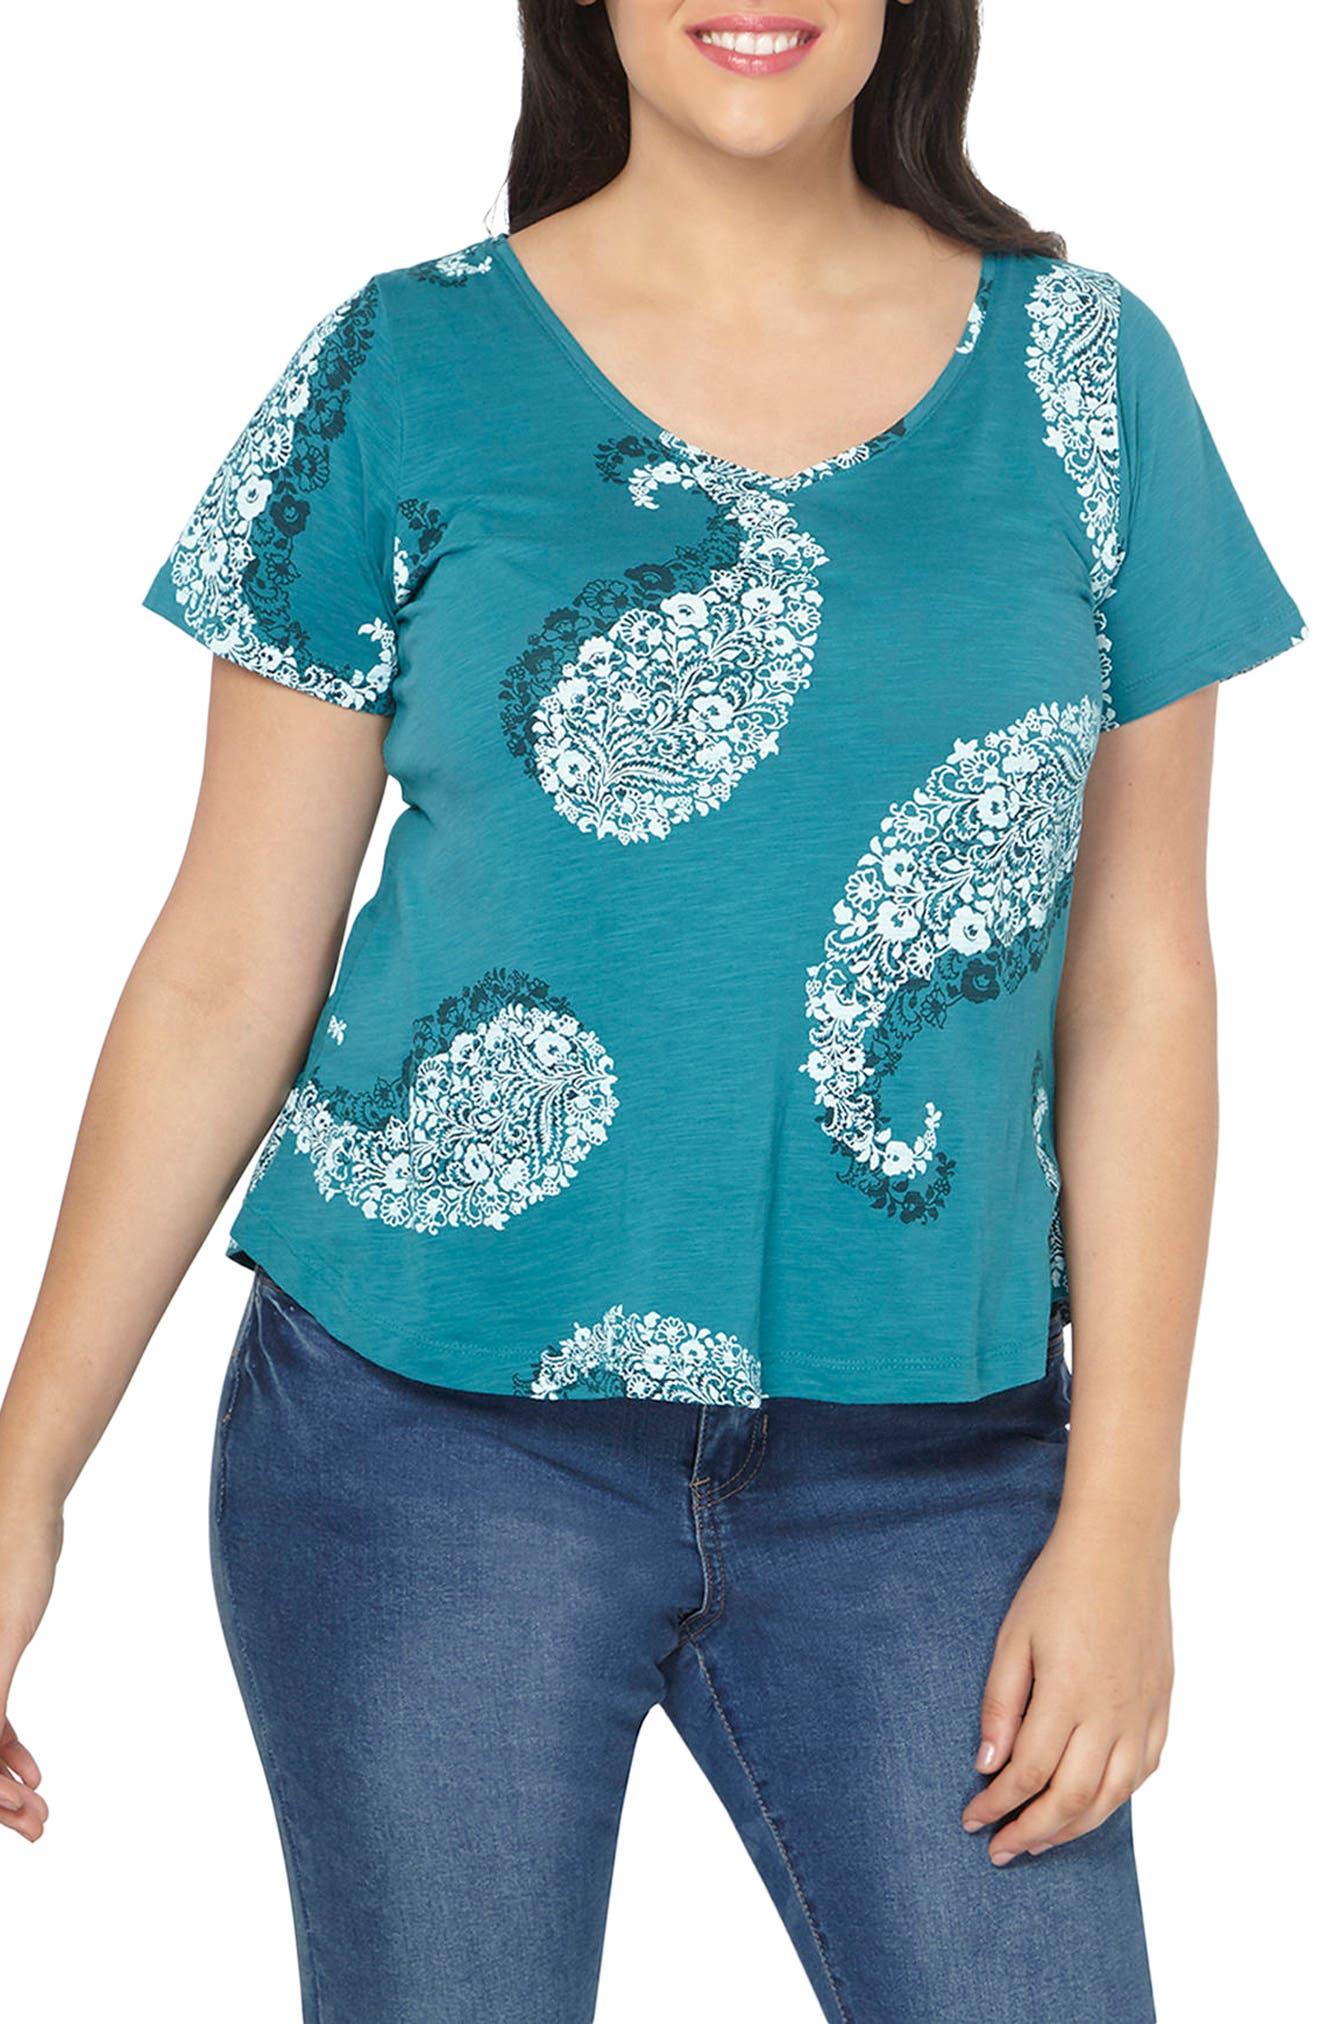 Evan Paisley Short Sleeve Shirt,                         Main,                         color, Turquoise